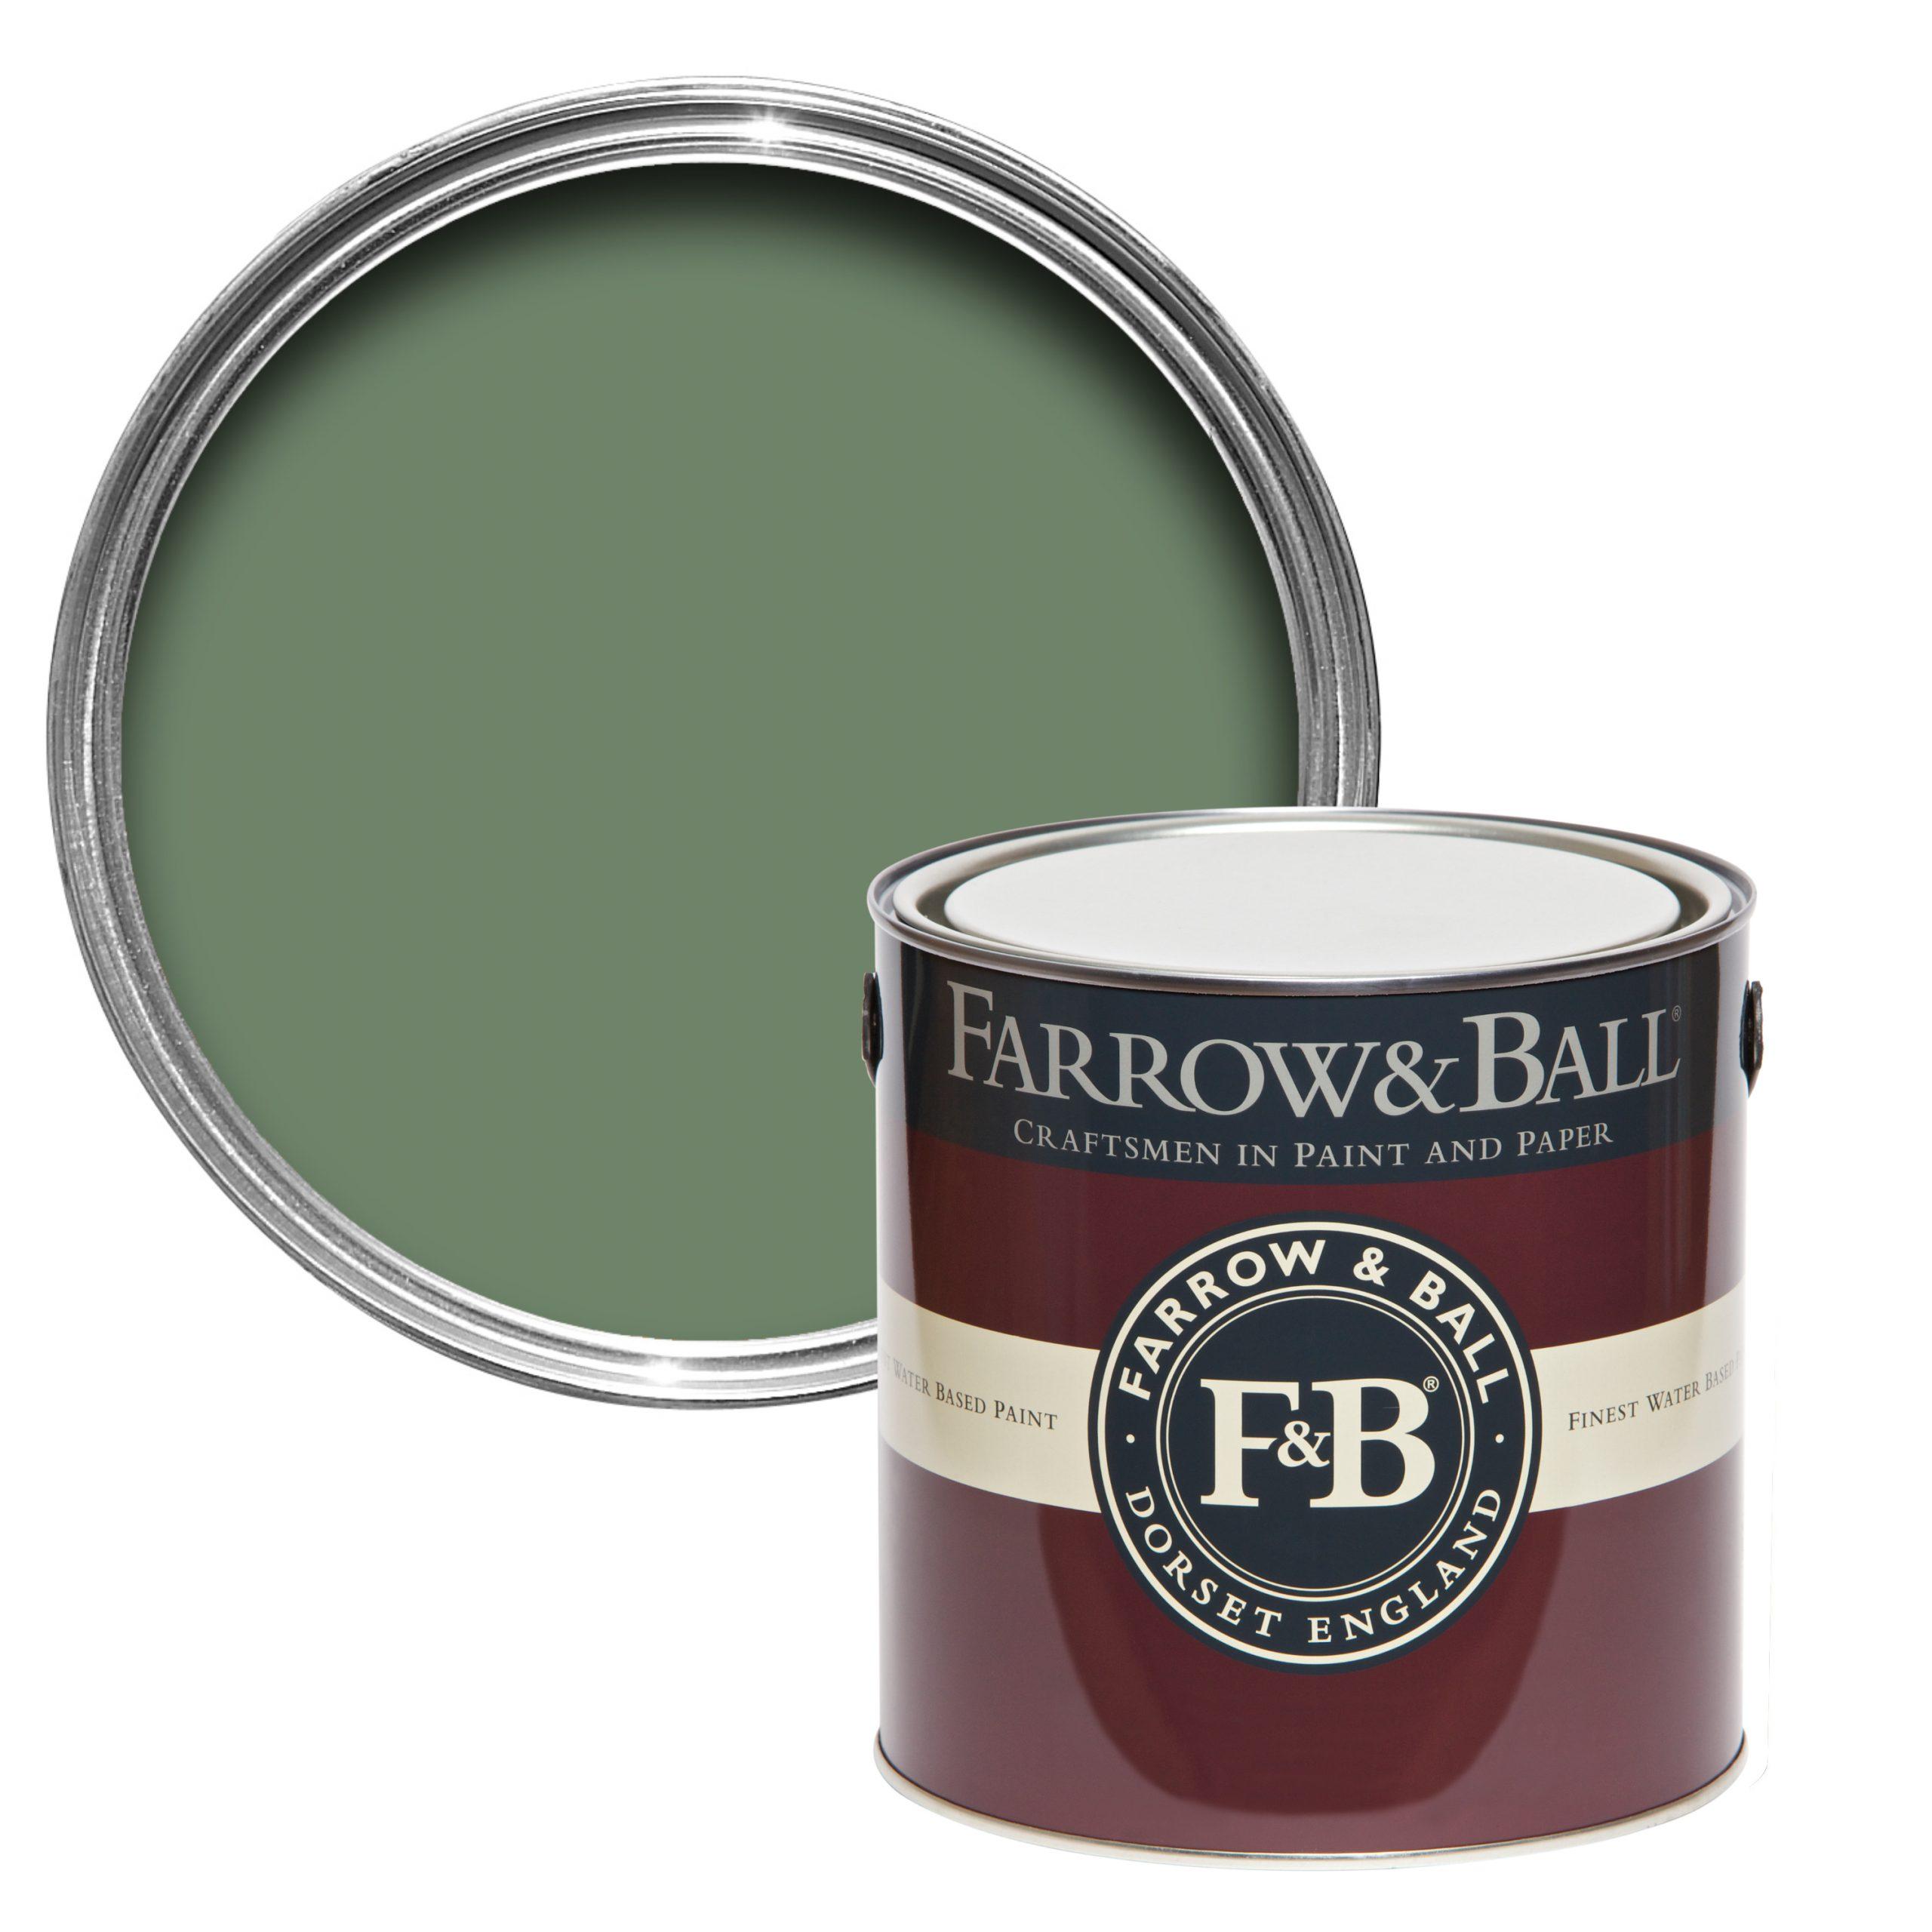 Farrow & Ball - Calke Green 34 Rooms With a View